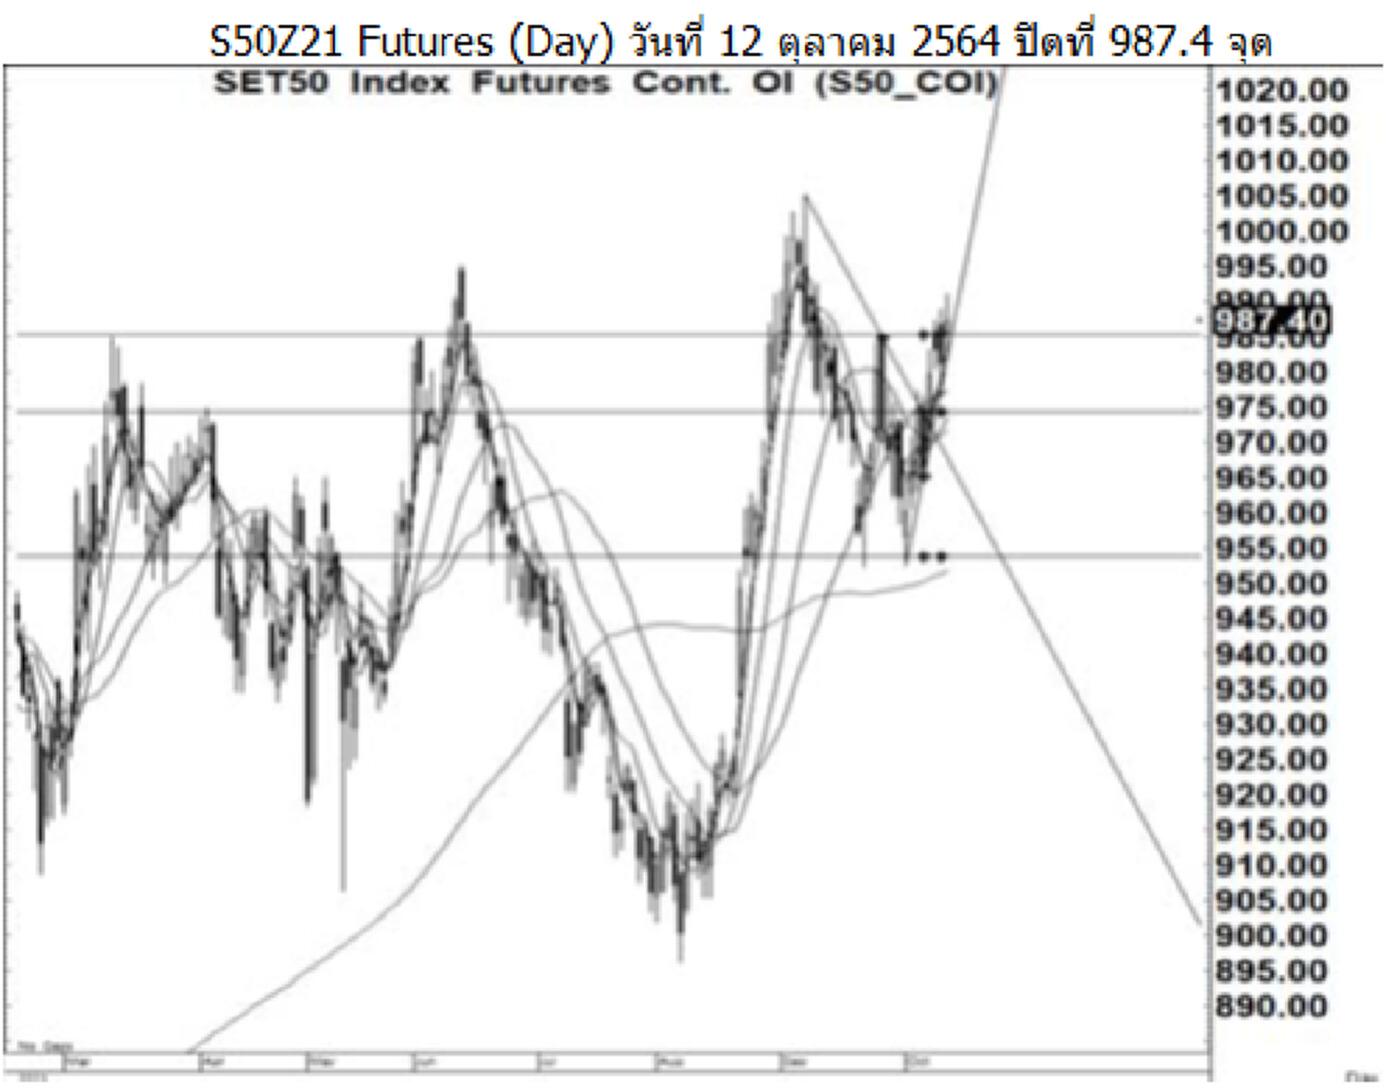 Daily SET50 Futures (วันที่ 14 ตุลาคม 2564)